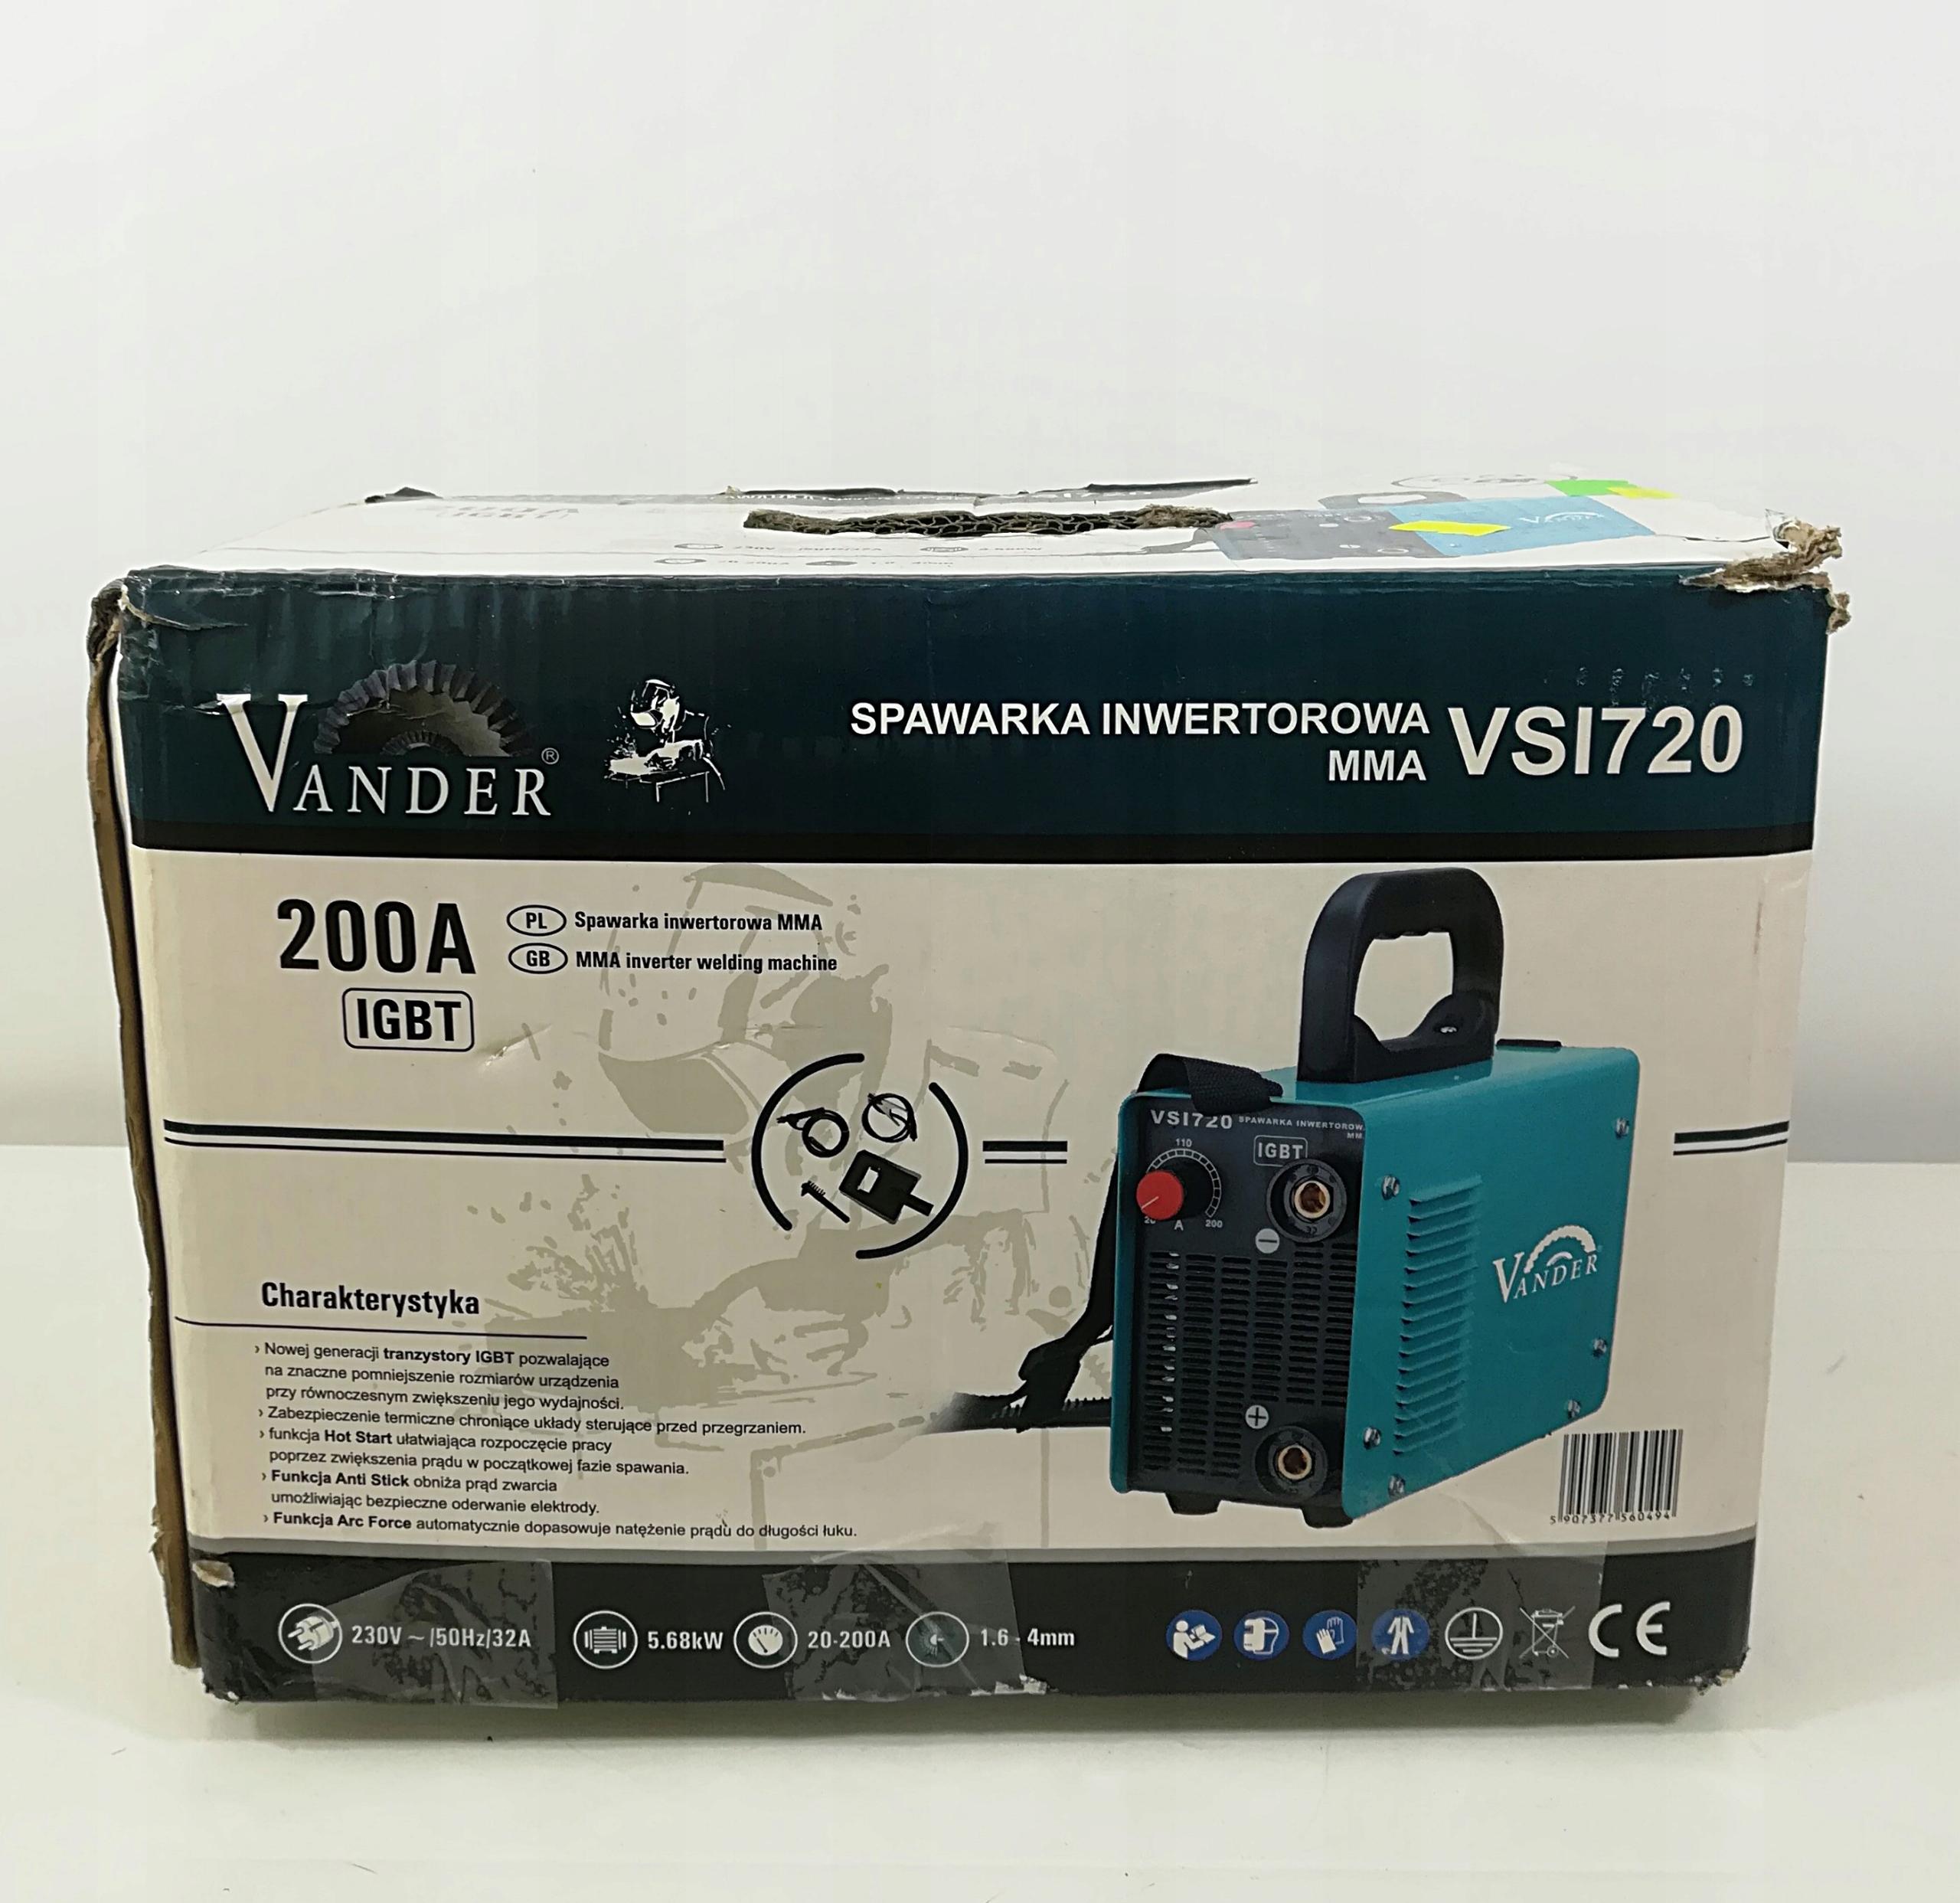 Spawarka Inwertorowa Vander VSI720